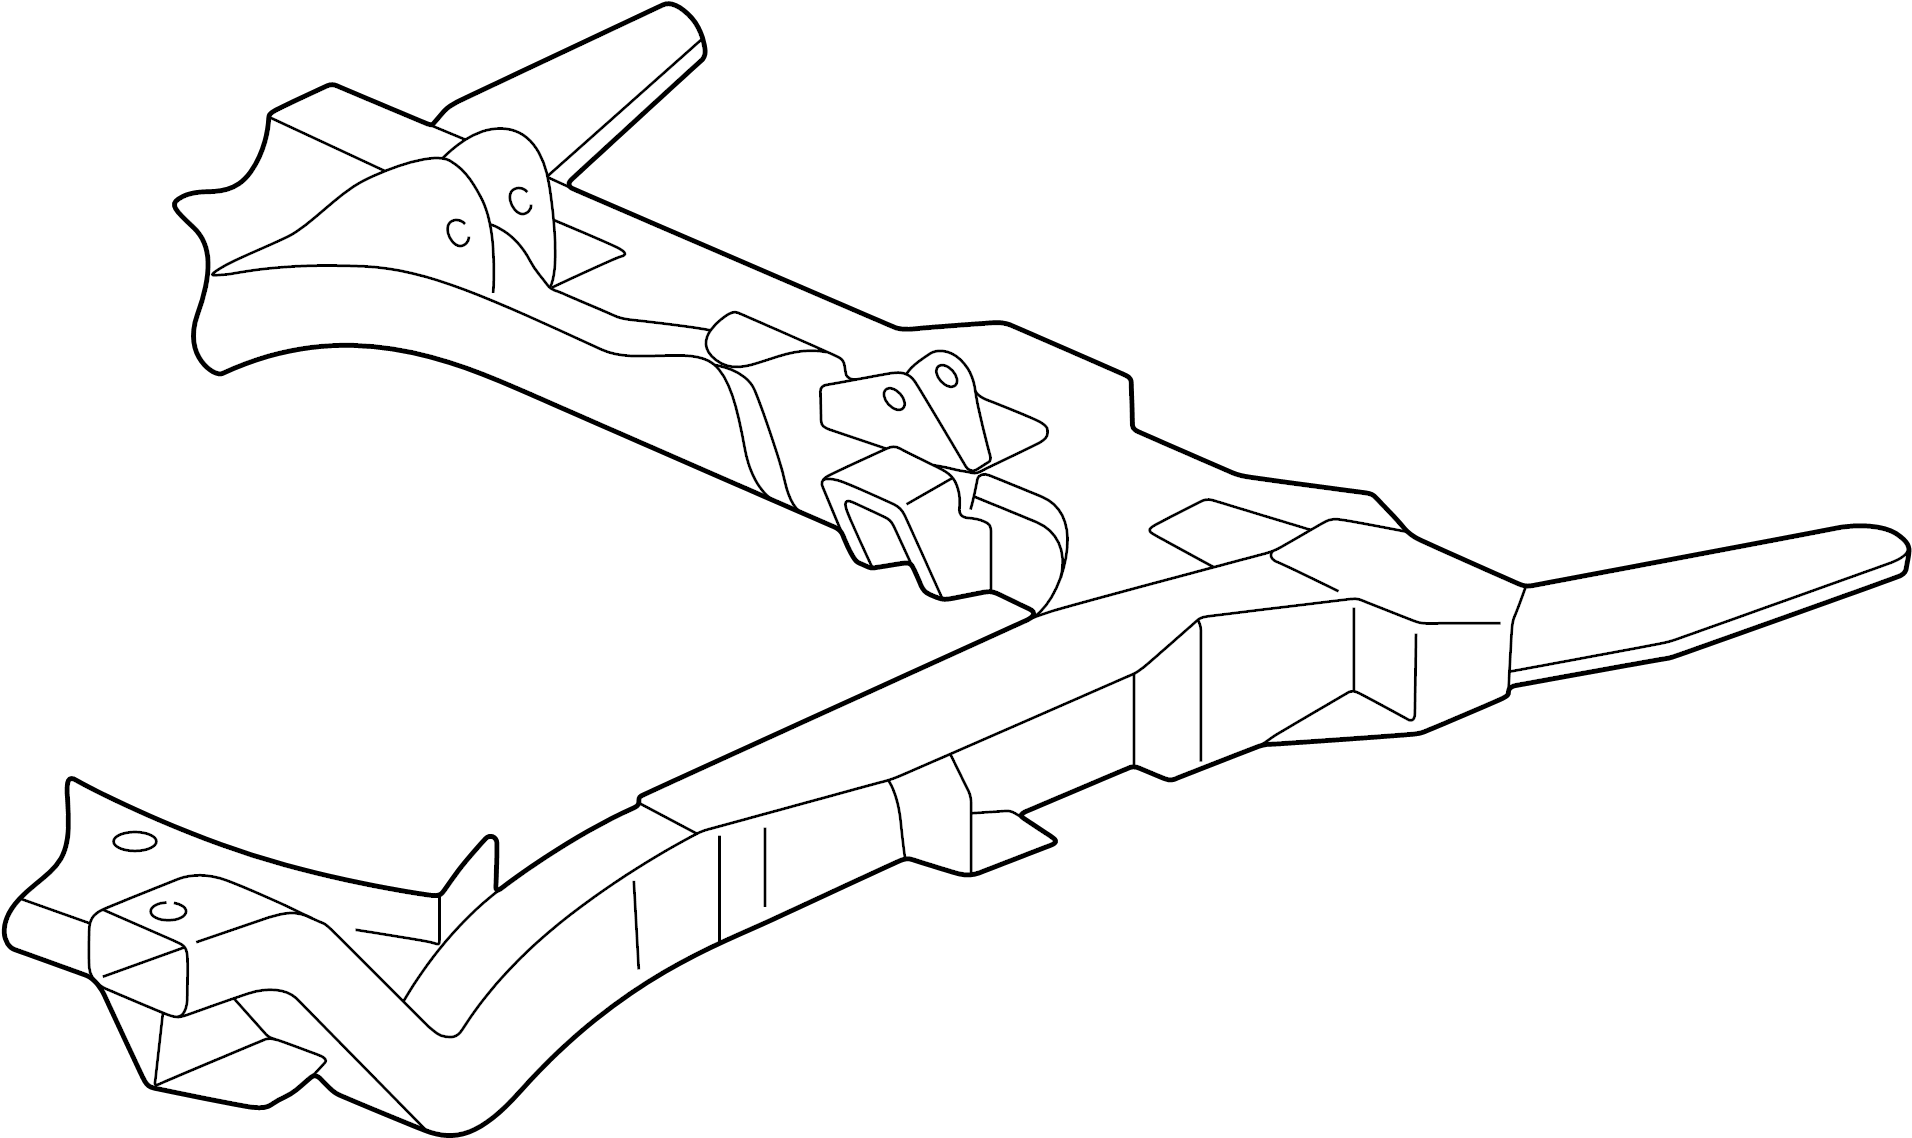 Oldsmobile Alero Crossmember Engine Cradle Frame